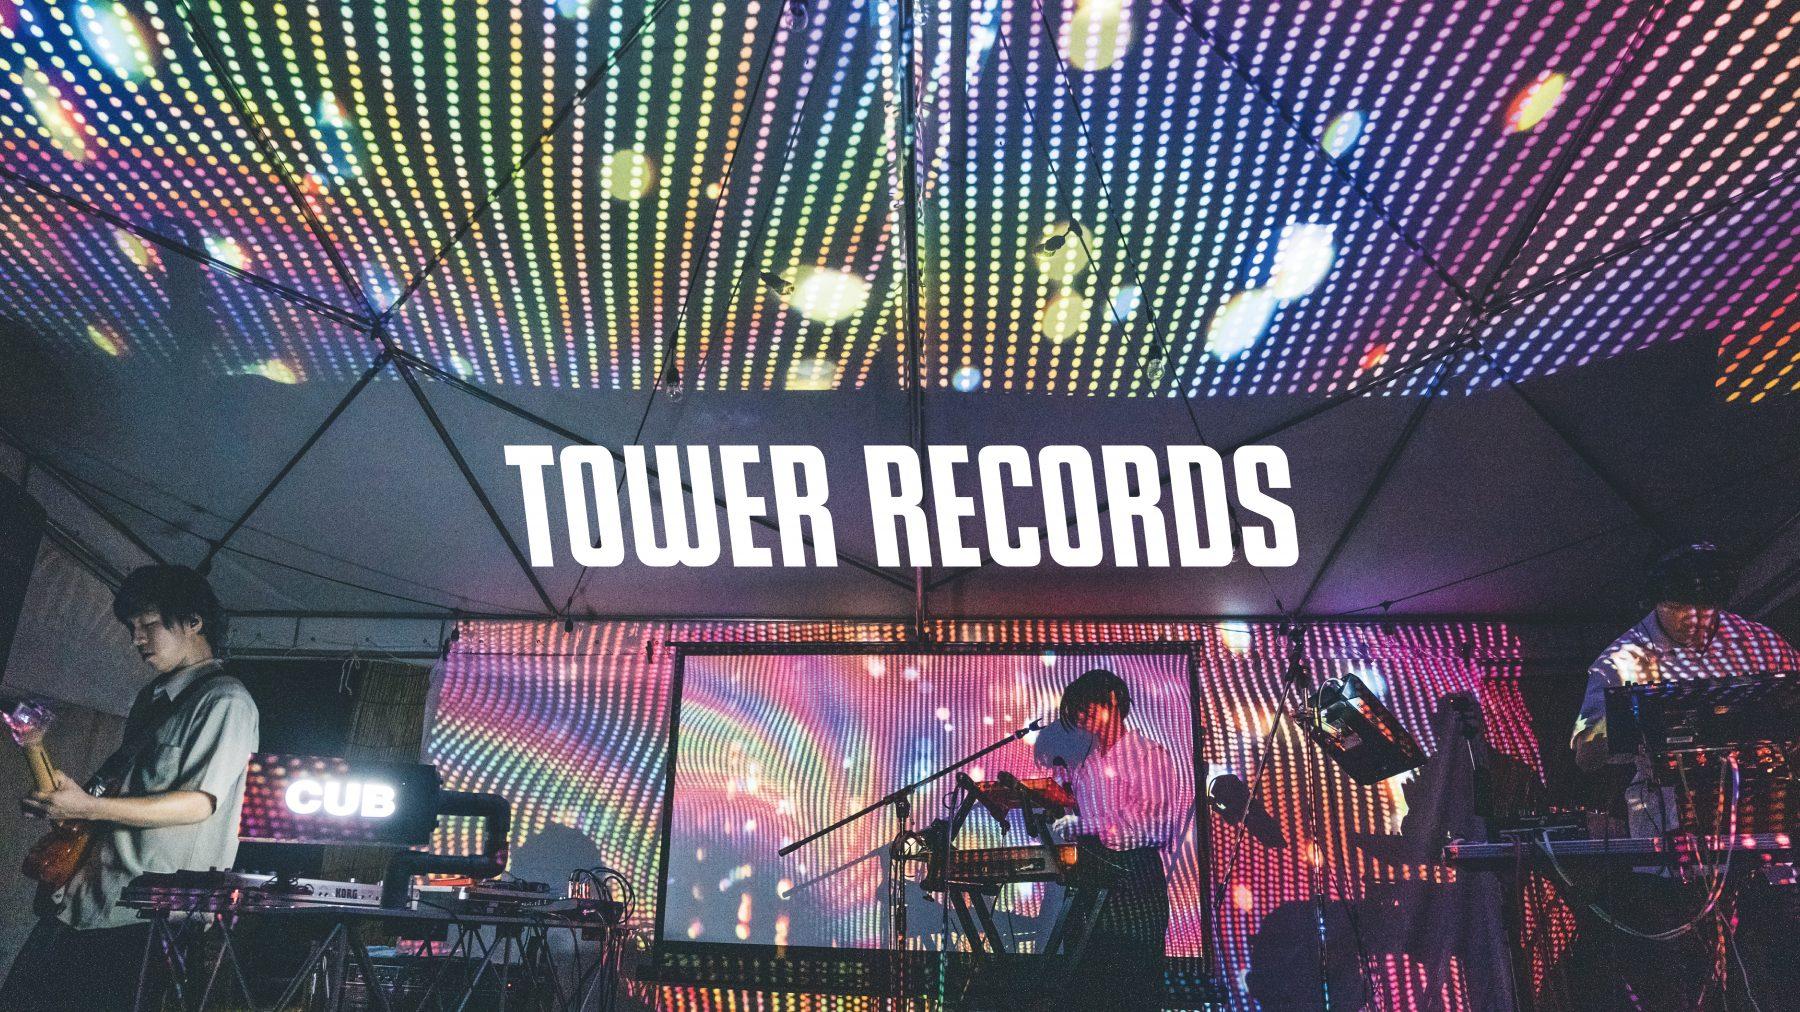 CUB / あなた (TOWER DOORS contents visual)